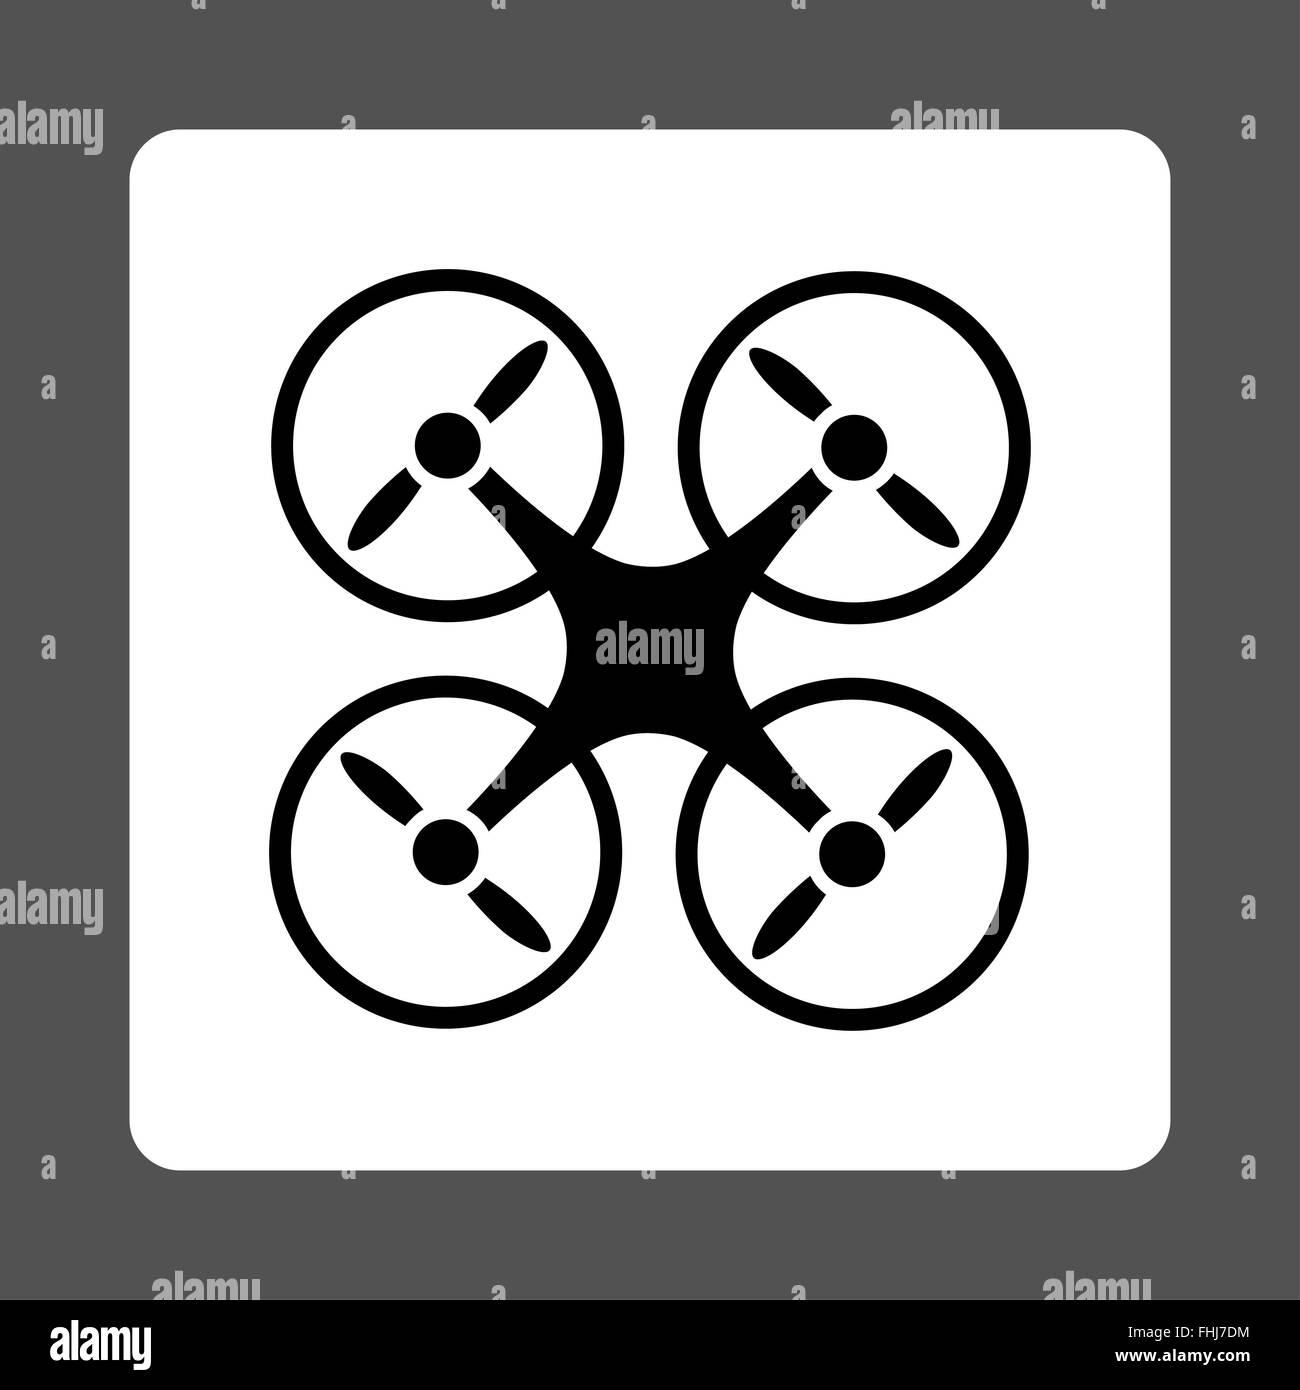 Nanocopter icon - Stock Image